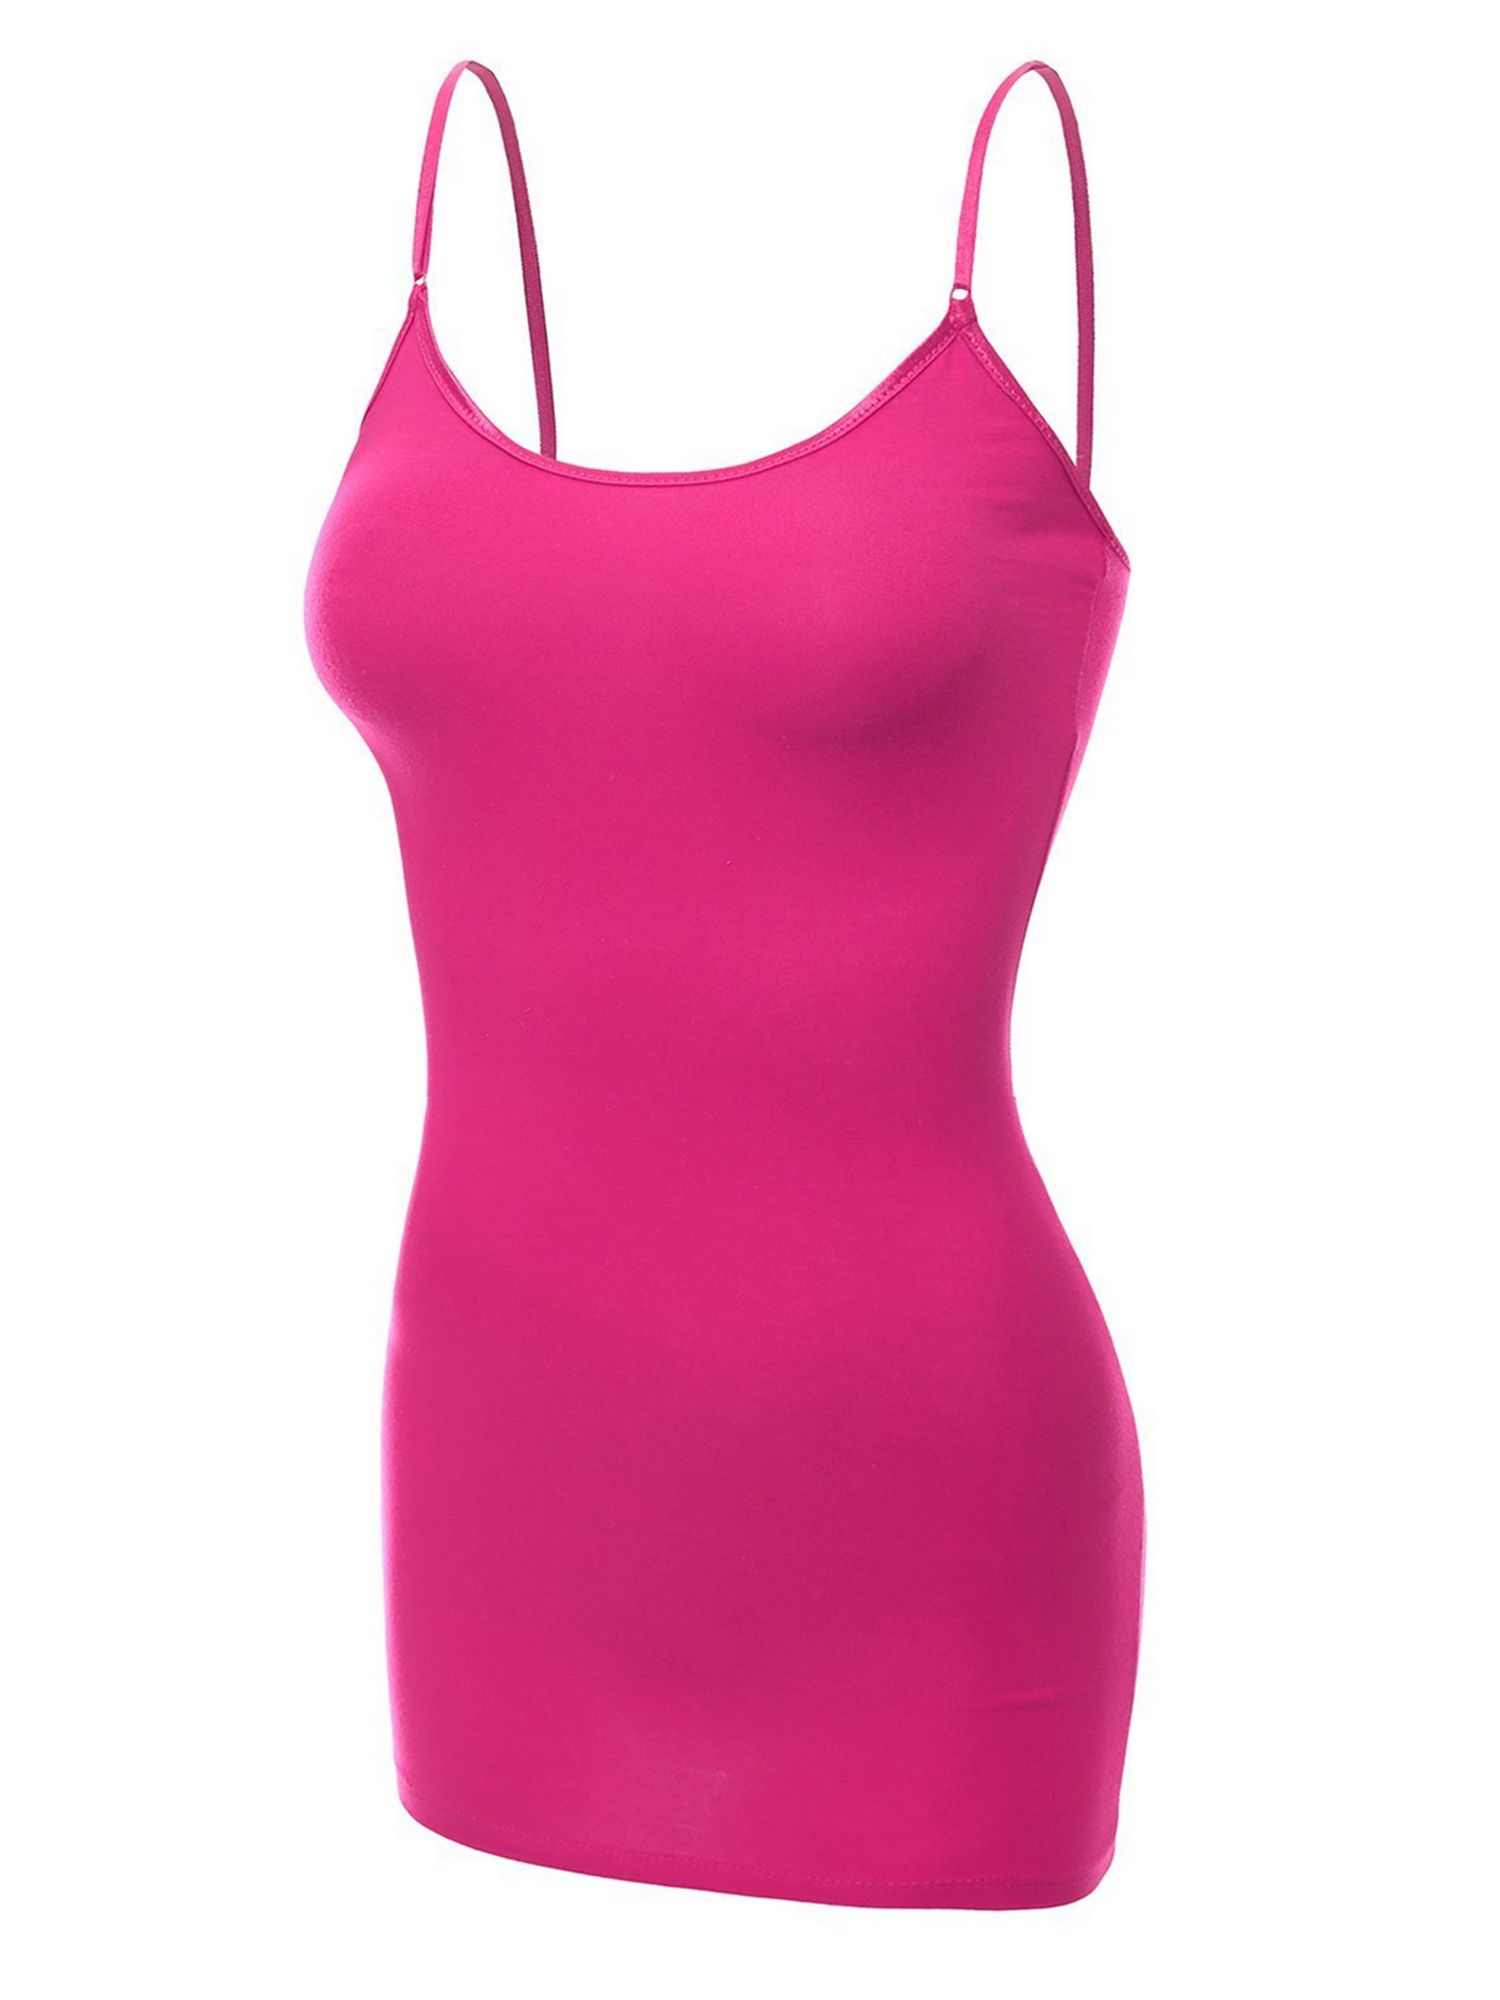 deeb1c366f392 Essential Basic Women Basic Built In Bra Spaghetti Strap Layering Cami Top  Tank - Junior Size